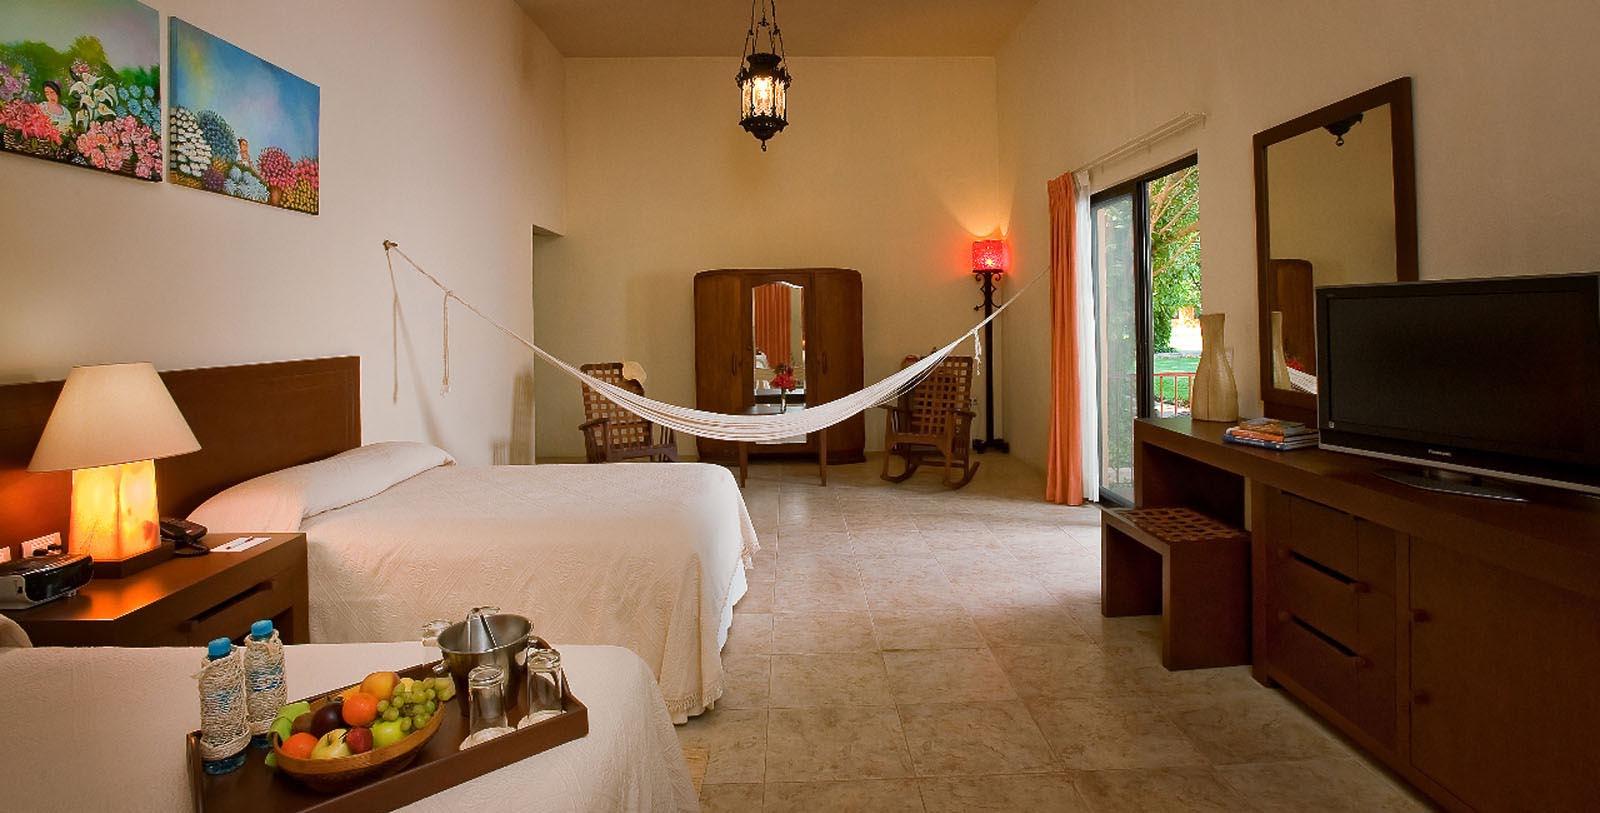 Image of Guestroom Interior, Hacienda Misne, Merida, Mexico, 1700s, Member of Historic Hotels Worldwide, Accommodations